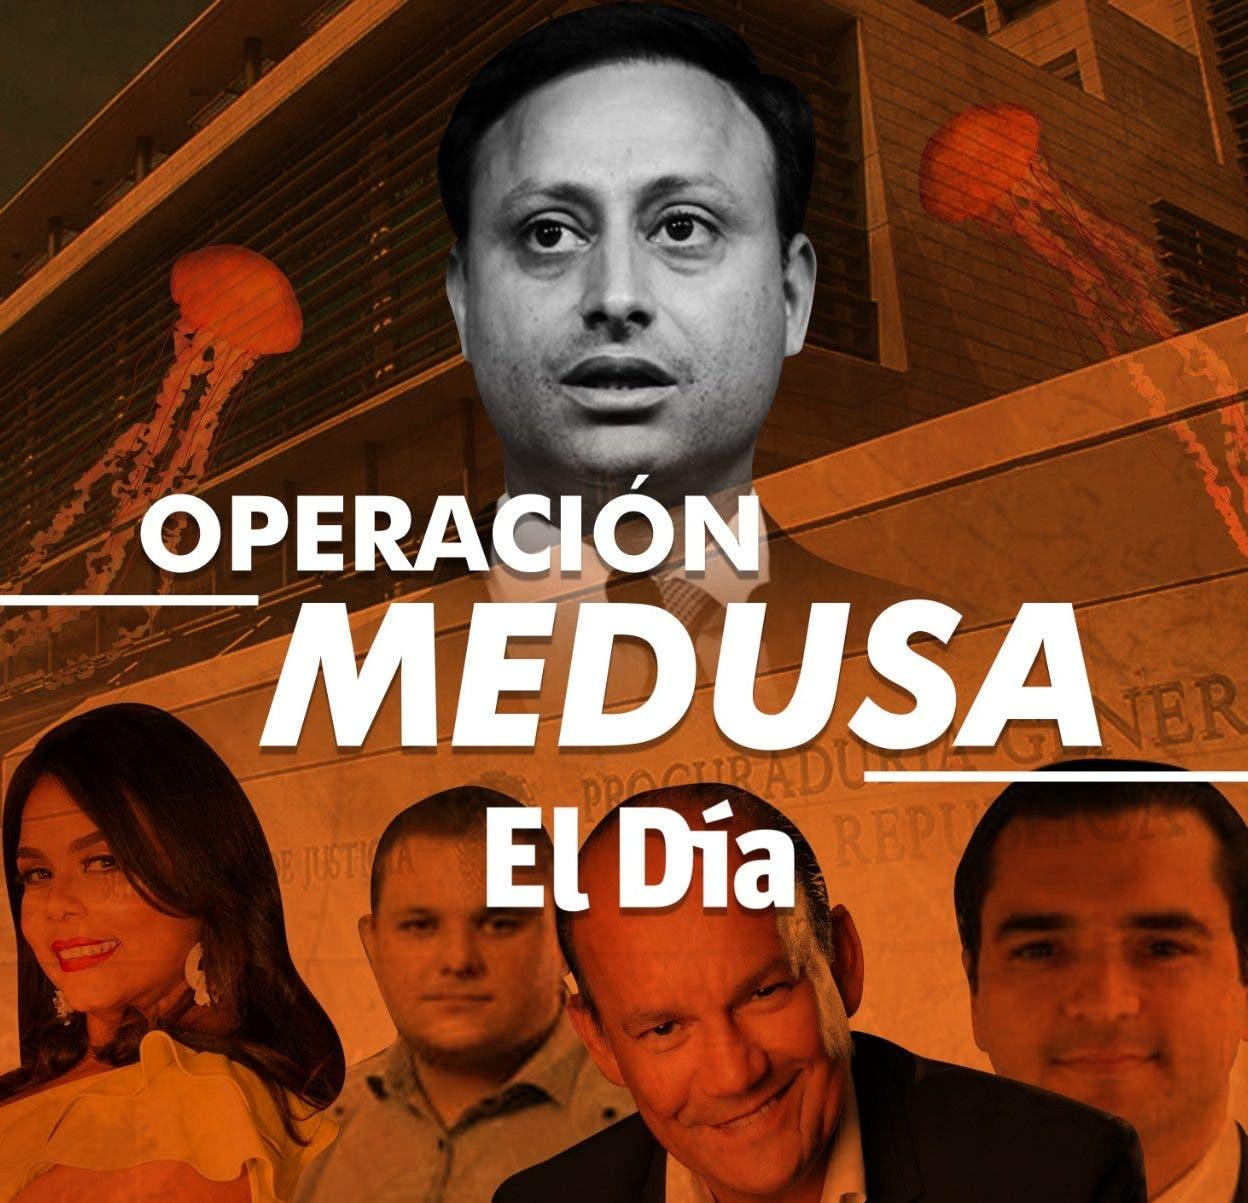 Operación Medusa: imputados destruyeron evidencias y usaron PGR para recibir sobornos